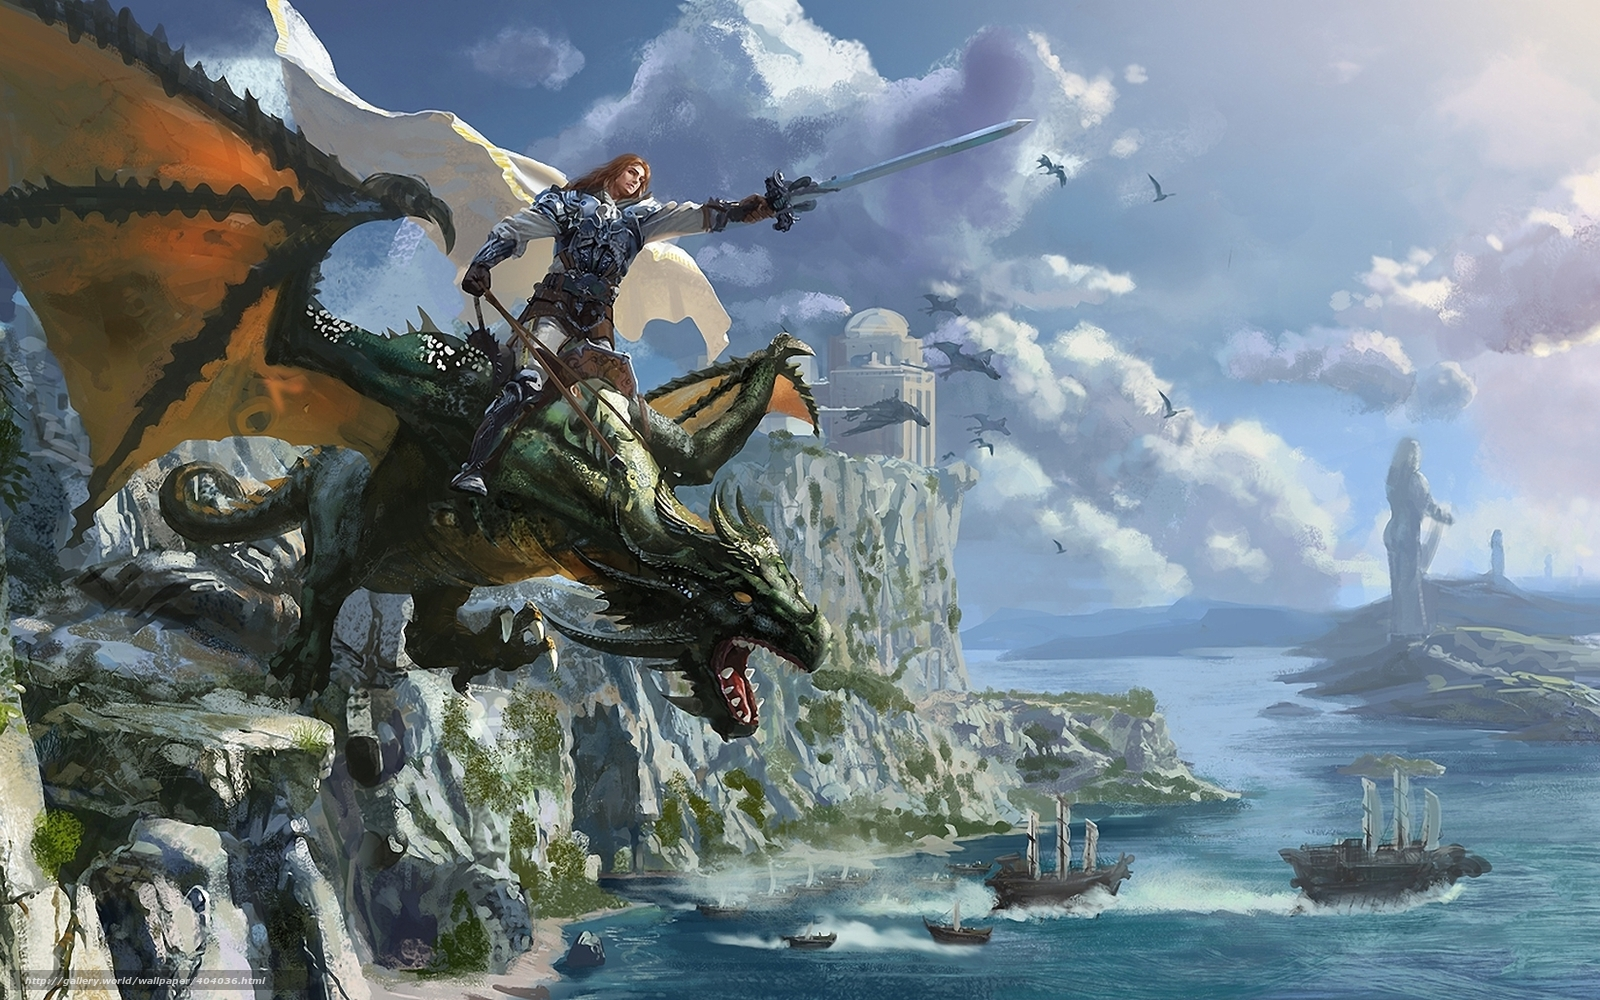 Download Wallpaper Art Dragon Rider Warrior Free